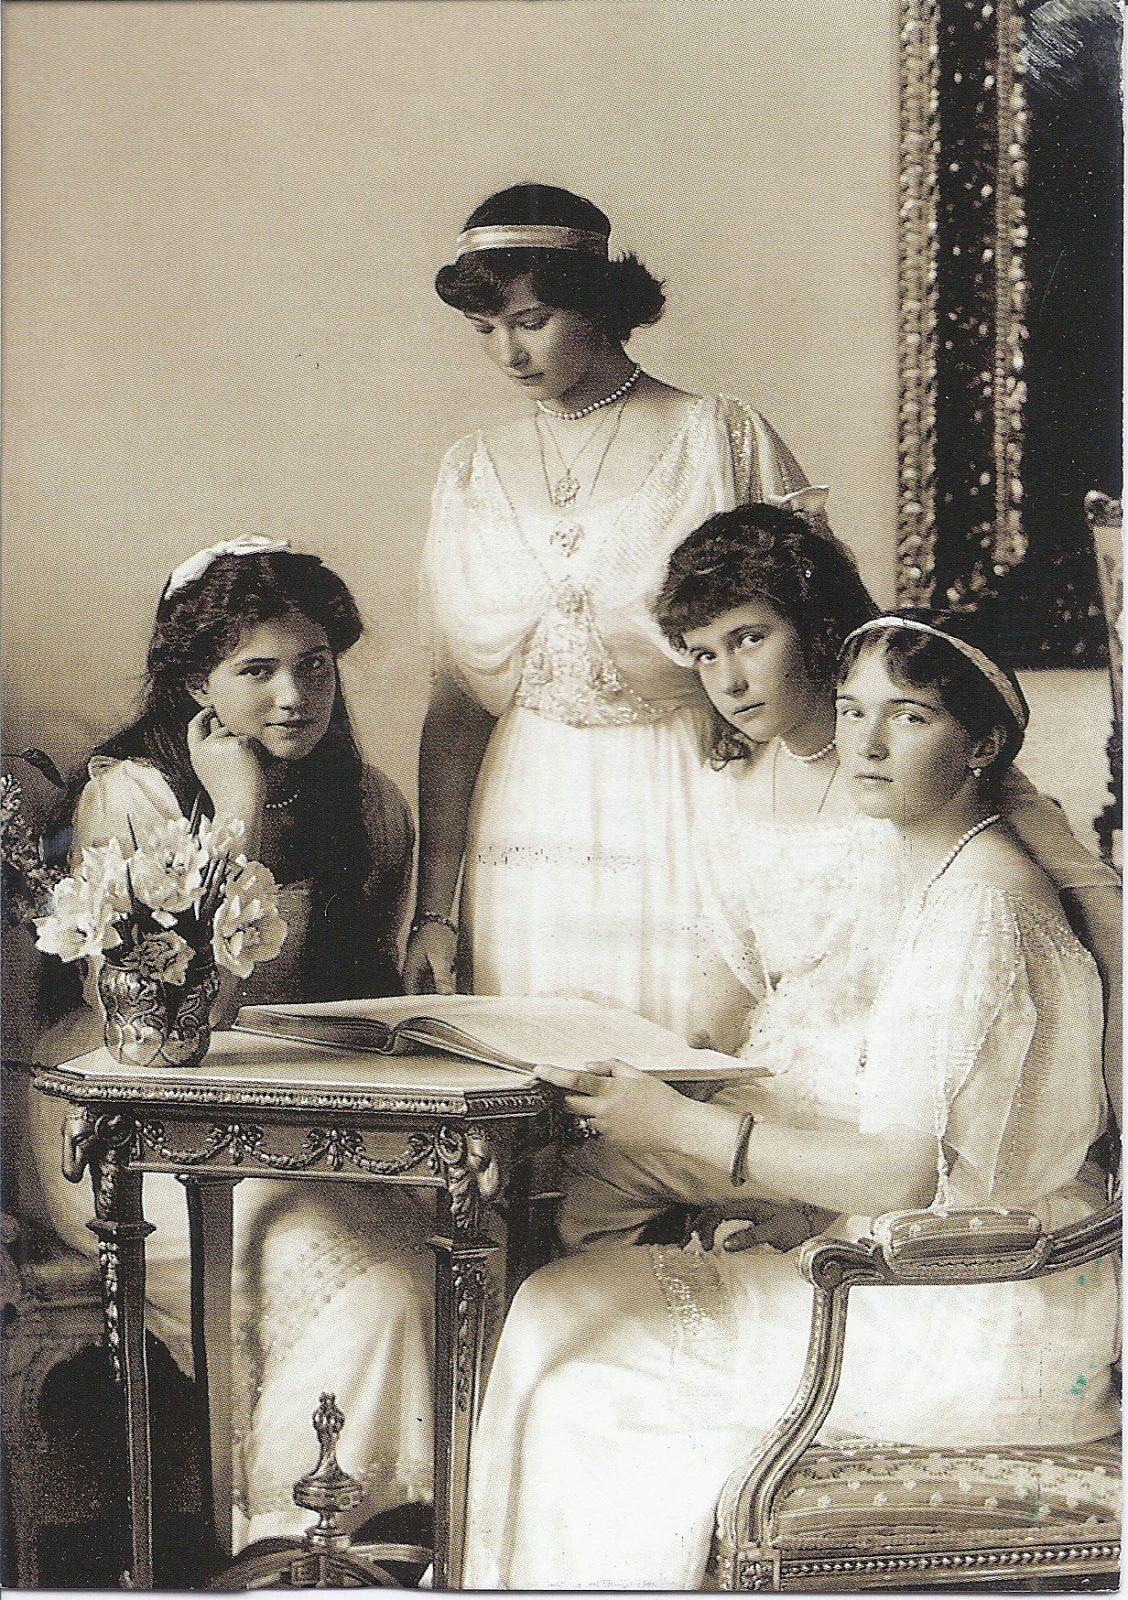 Grand Duchesses Olga, Tatiana, Maria Anastasia of Russia